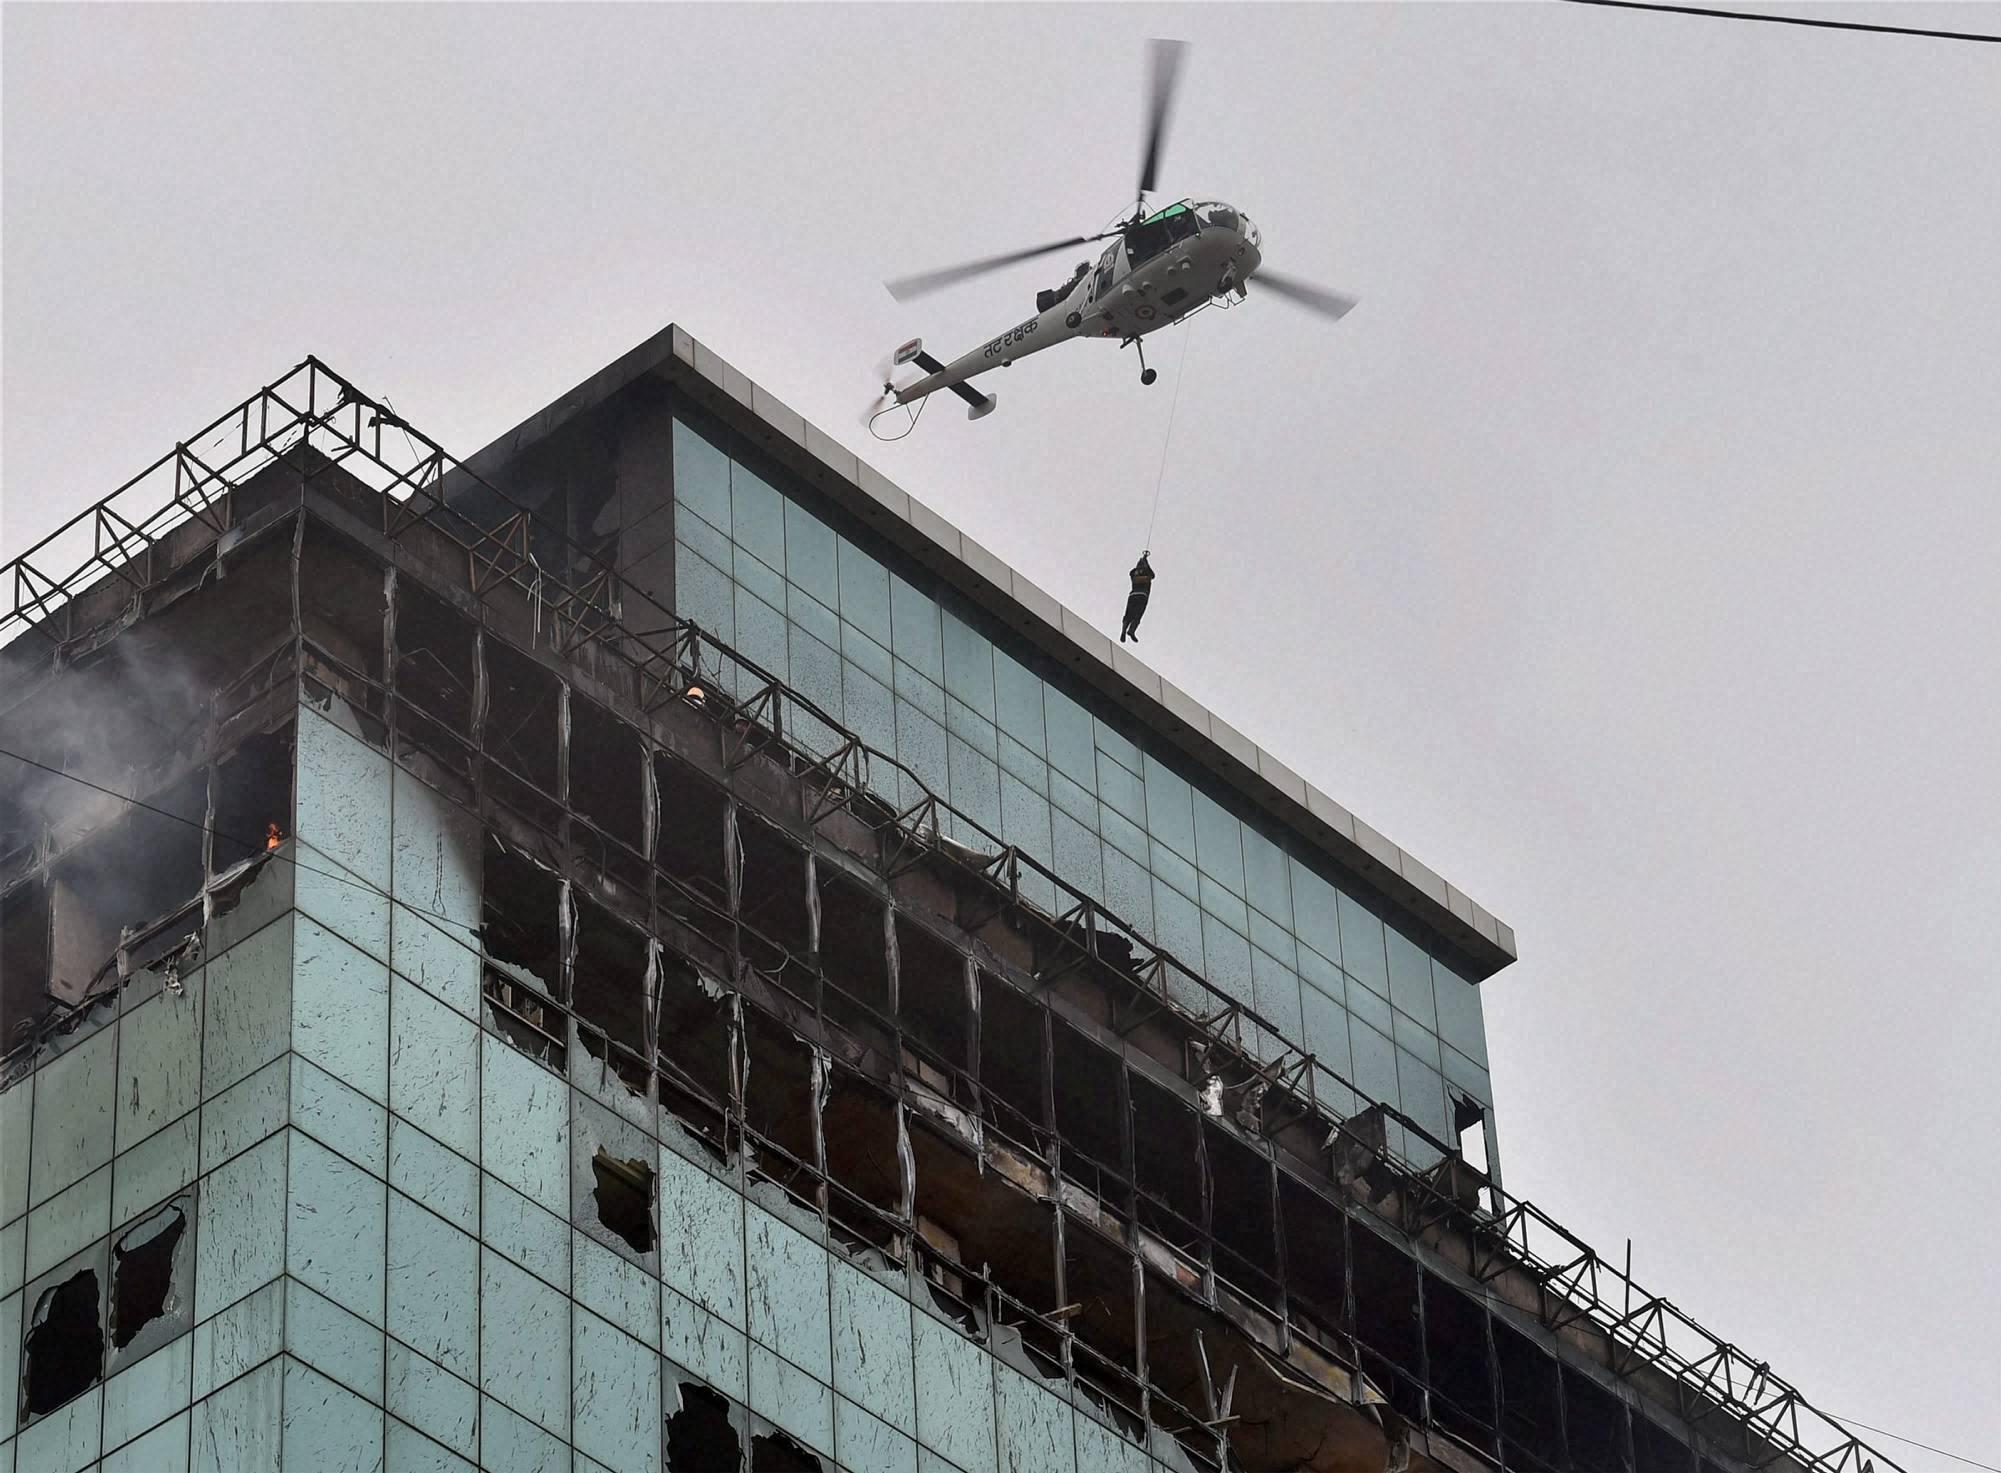 Coast Guard chopper, rescues, man, Lotus Business Park, Building, fire broke out, Andheri, Mumbai